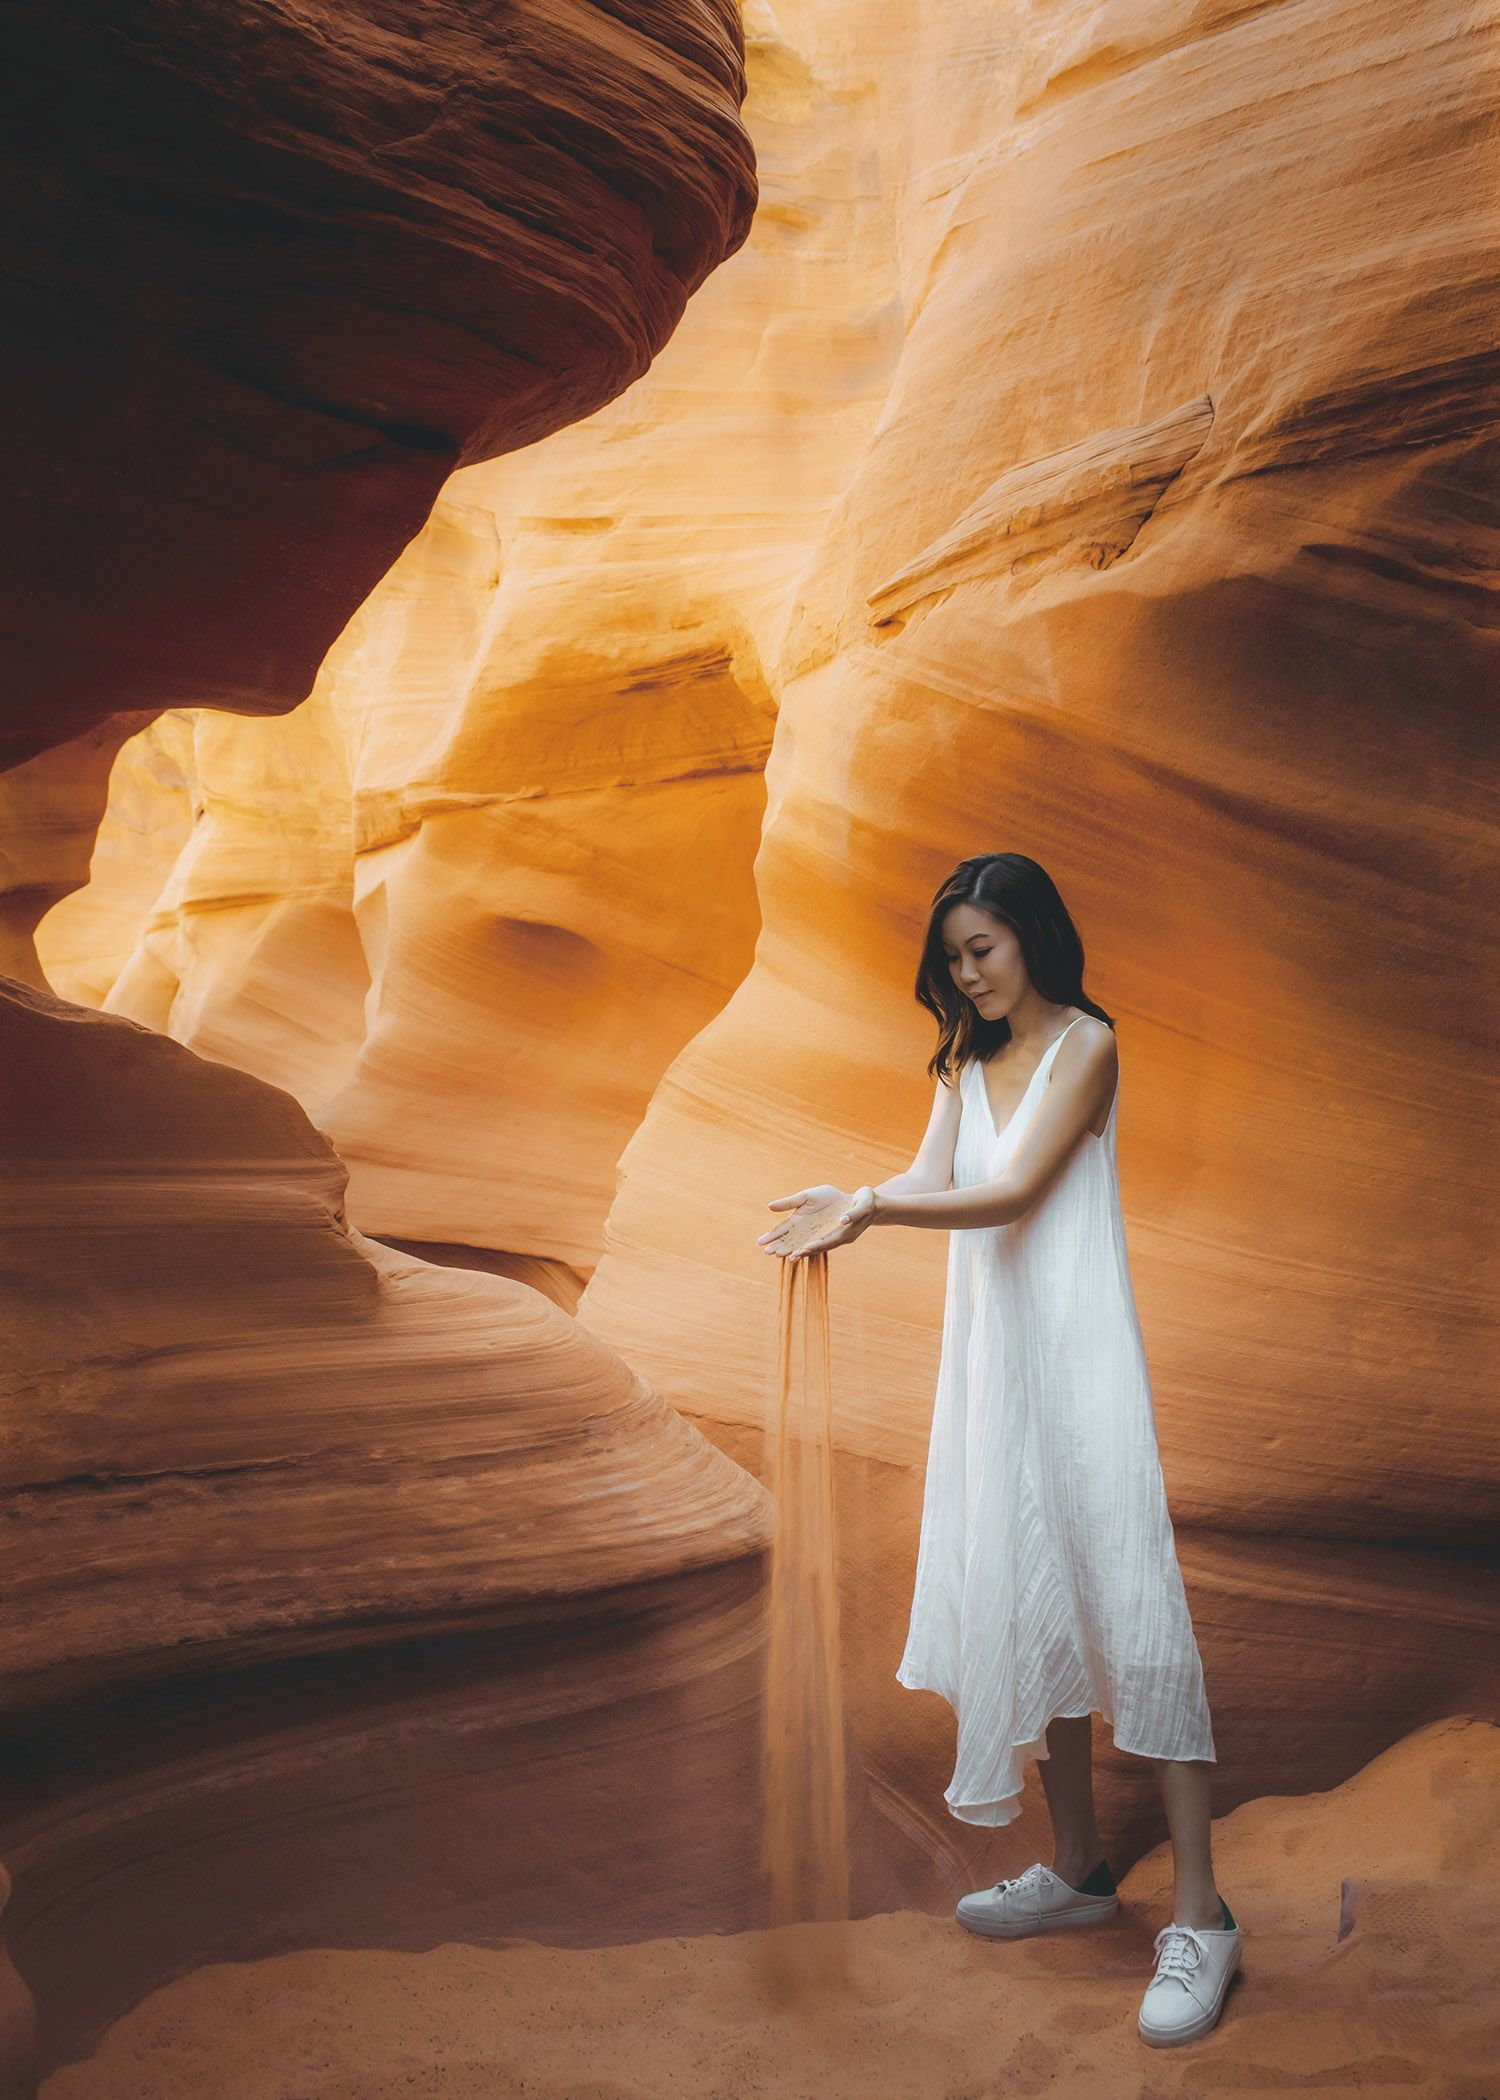 61884b6c8ed Arizona must visit top 5 Antelope Canyon Must visit Lifestyle fashion  travel blogger Jenny Tsang of Tsangtastic wearing white dress and white  sneakers in .